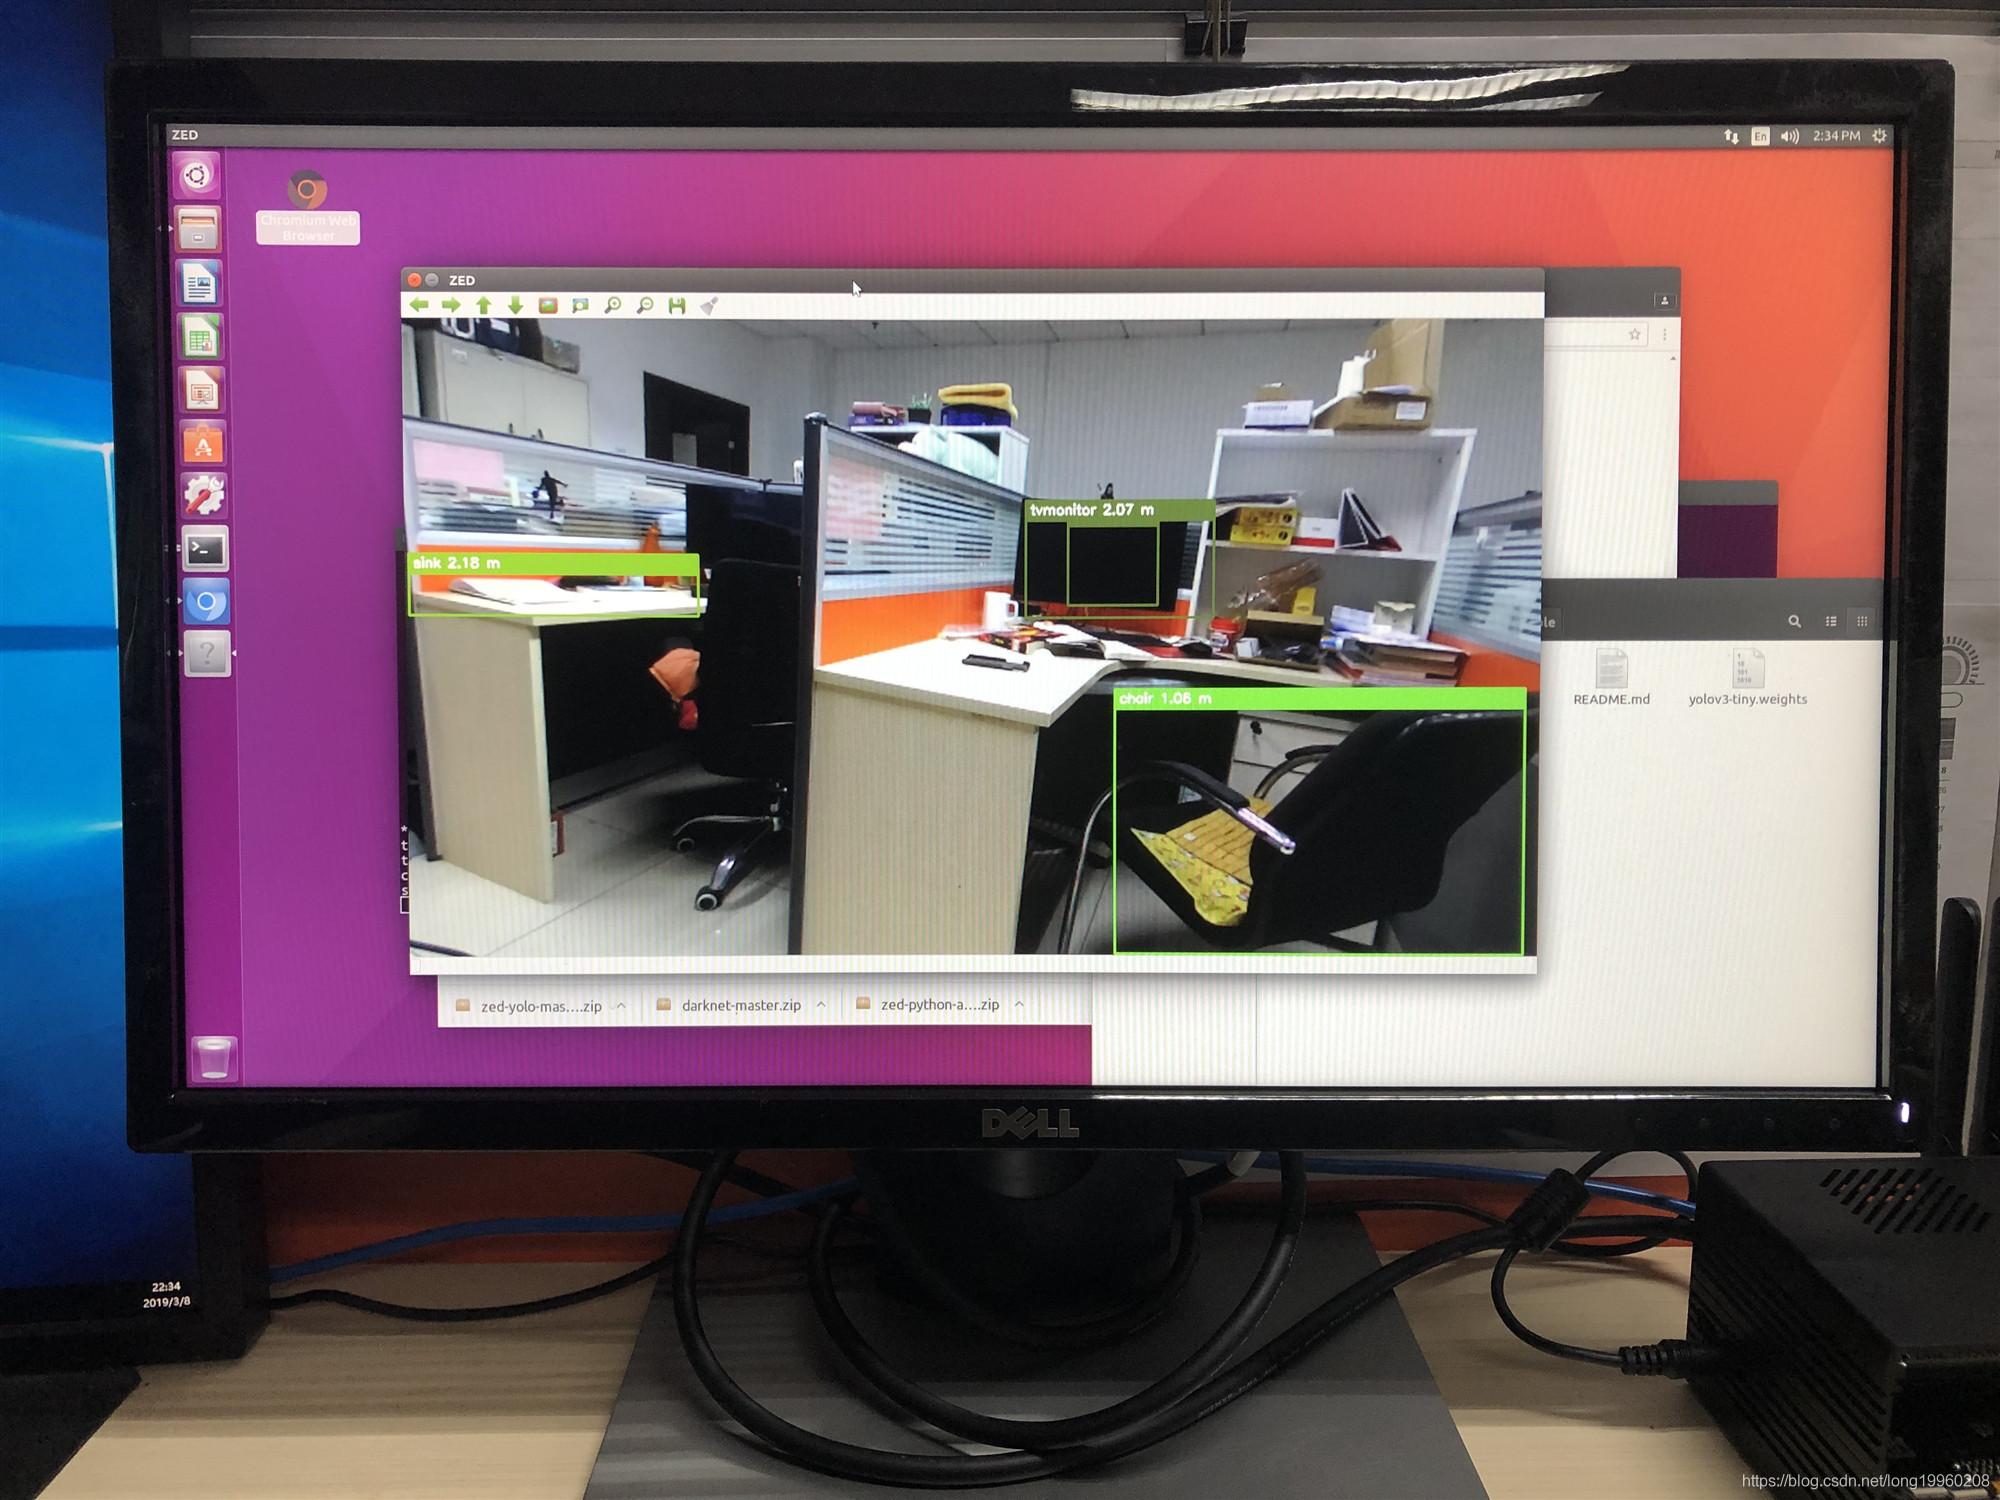 Jetson TX2利用python3语言在ZED相机上运行yolov3